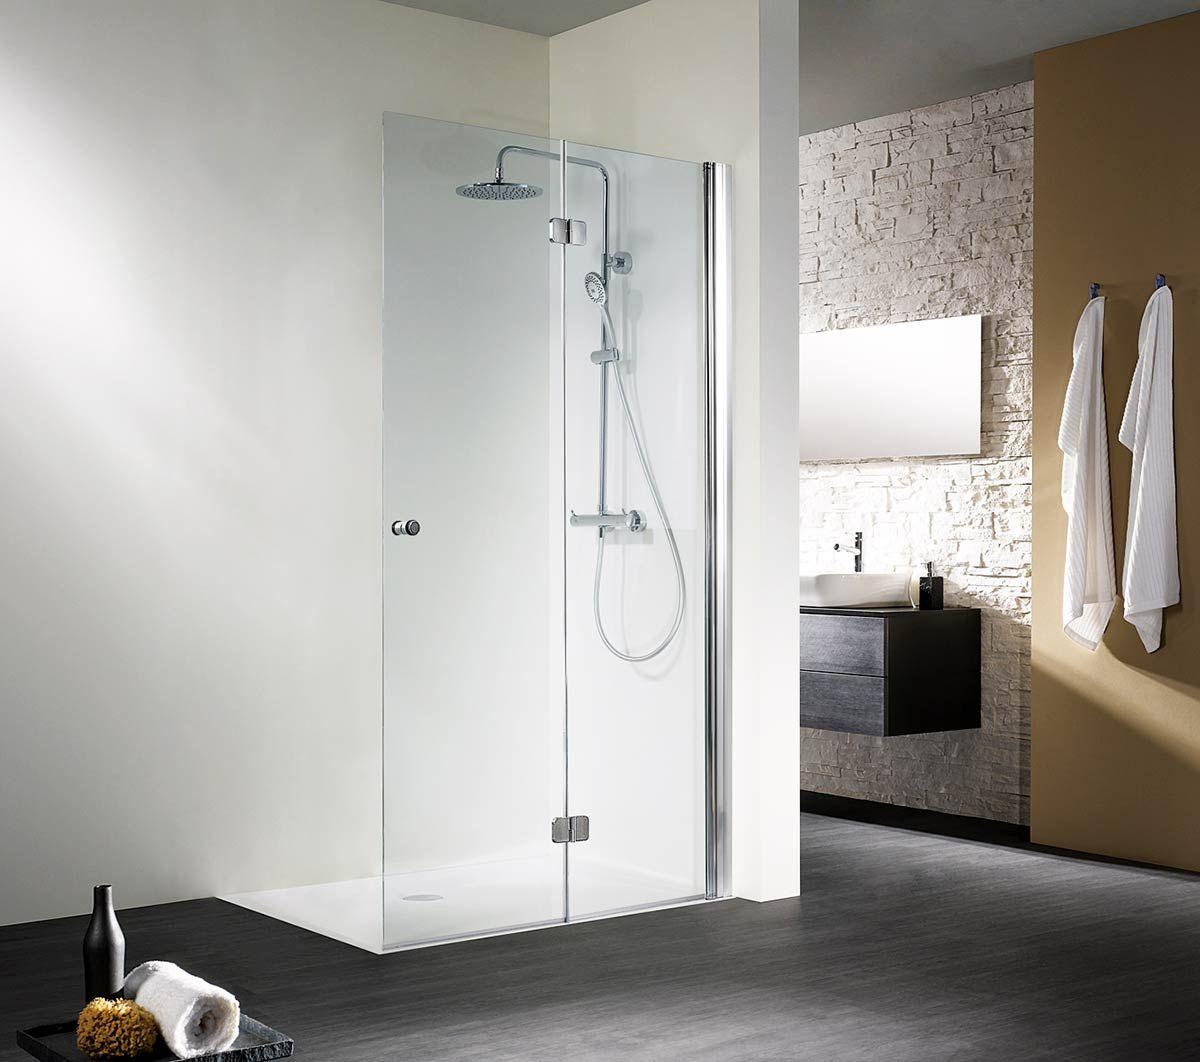 Walk In Duschwand Fur Begehbare Dusche Top Designs Von Hsk Duschwand Dusche Begehbare Dusche